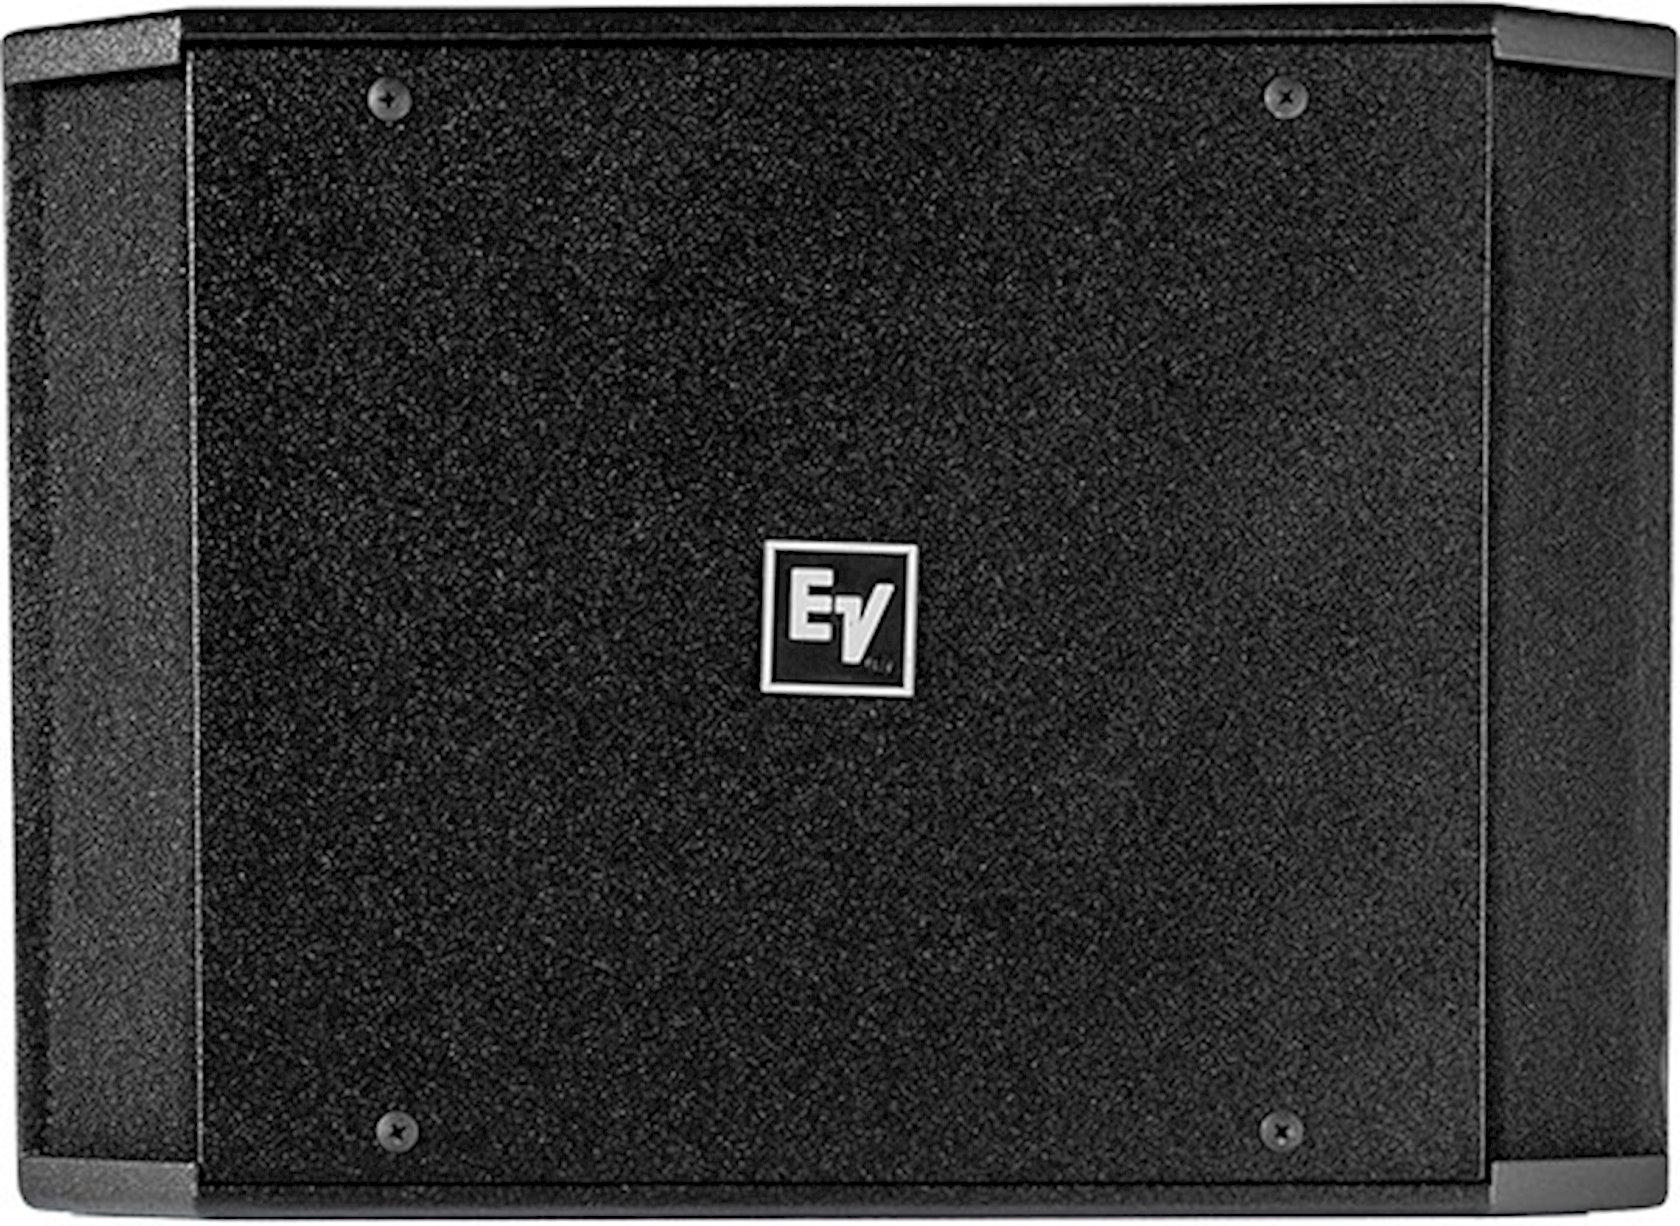 Sabvufer Electro-Voice Evid-S12.1W